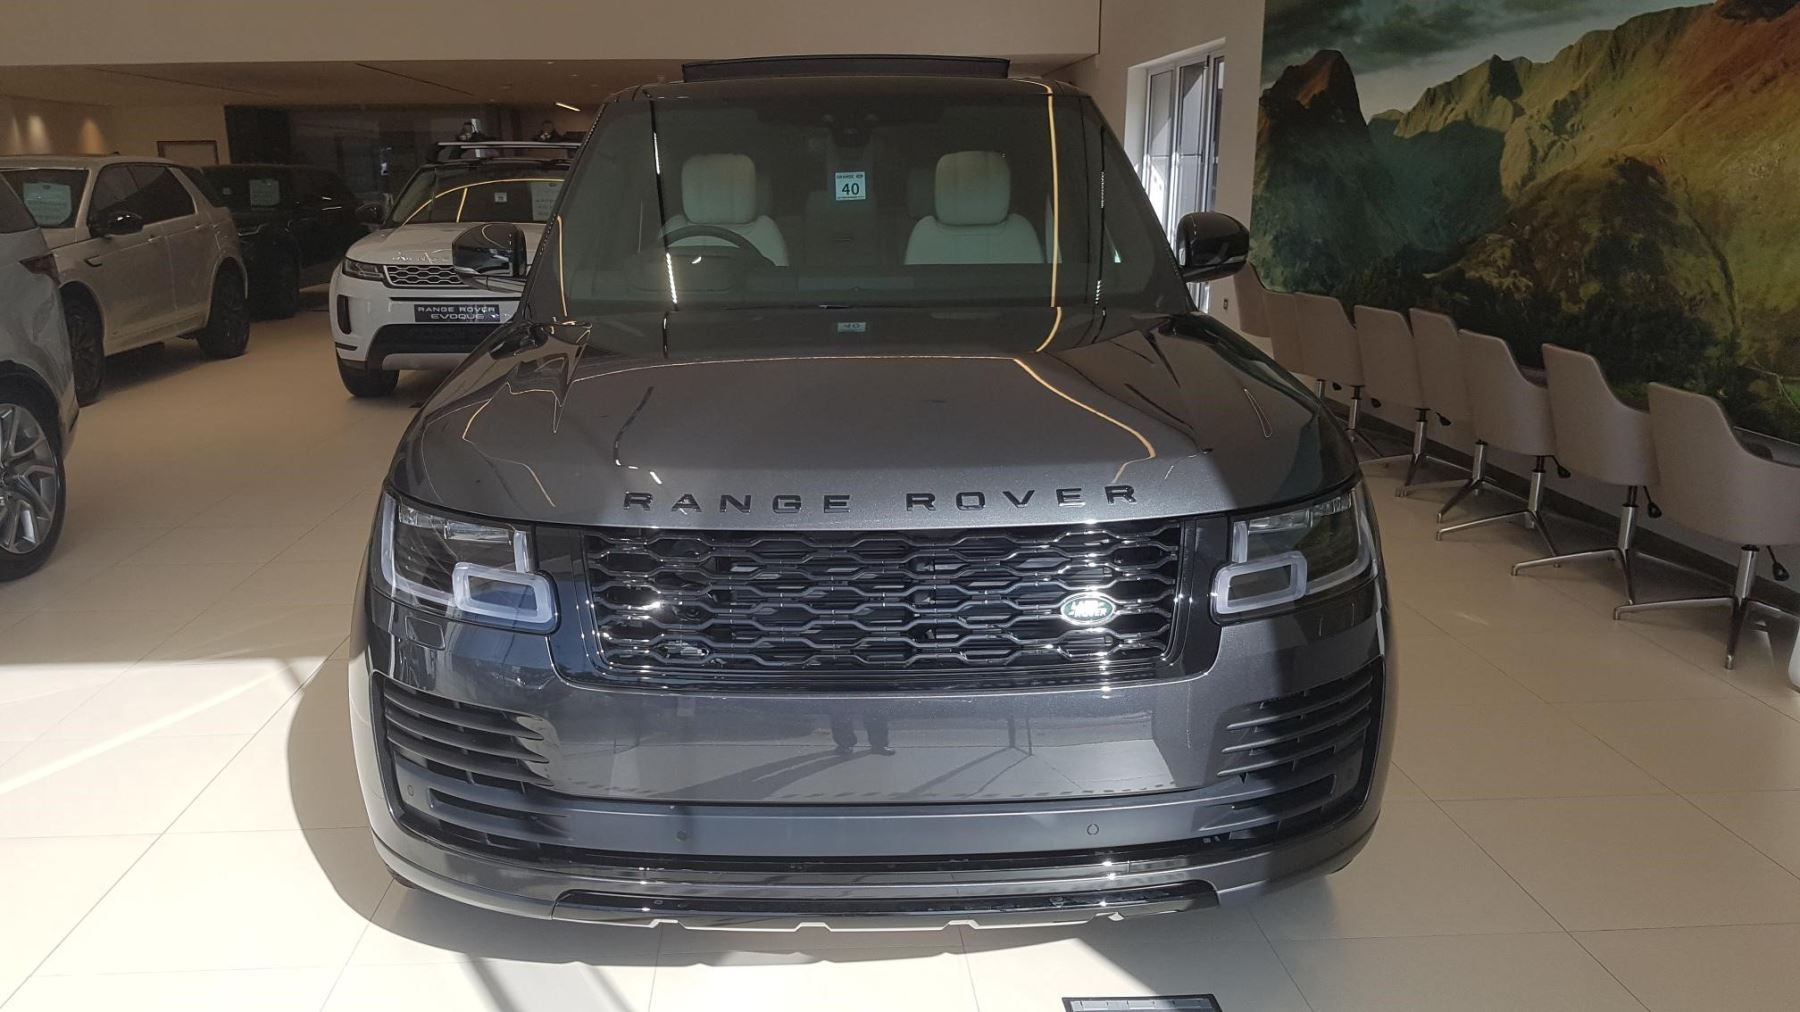 Land Rover Range Rover 3.0 P400 Vogue image 2